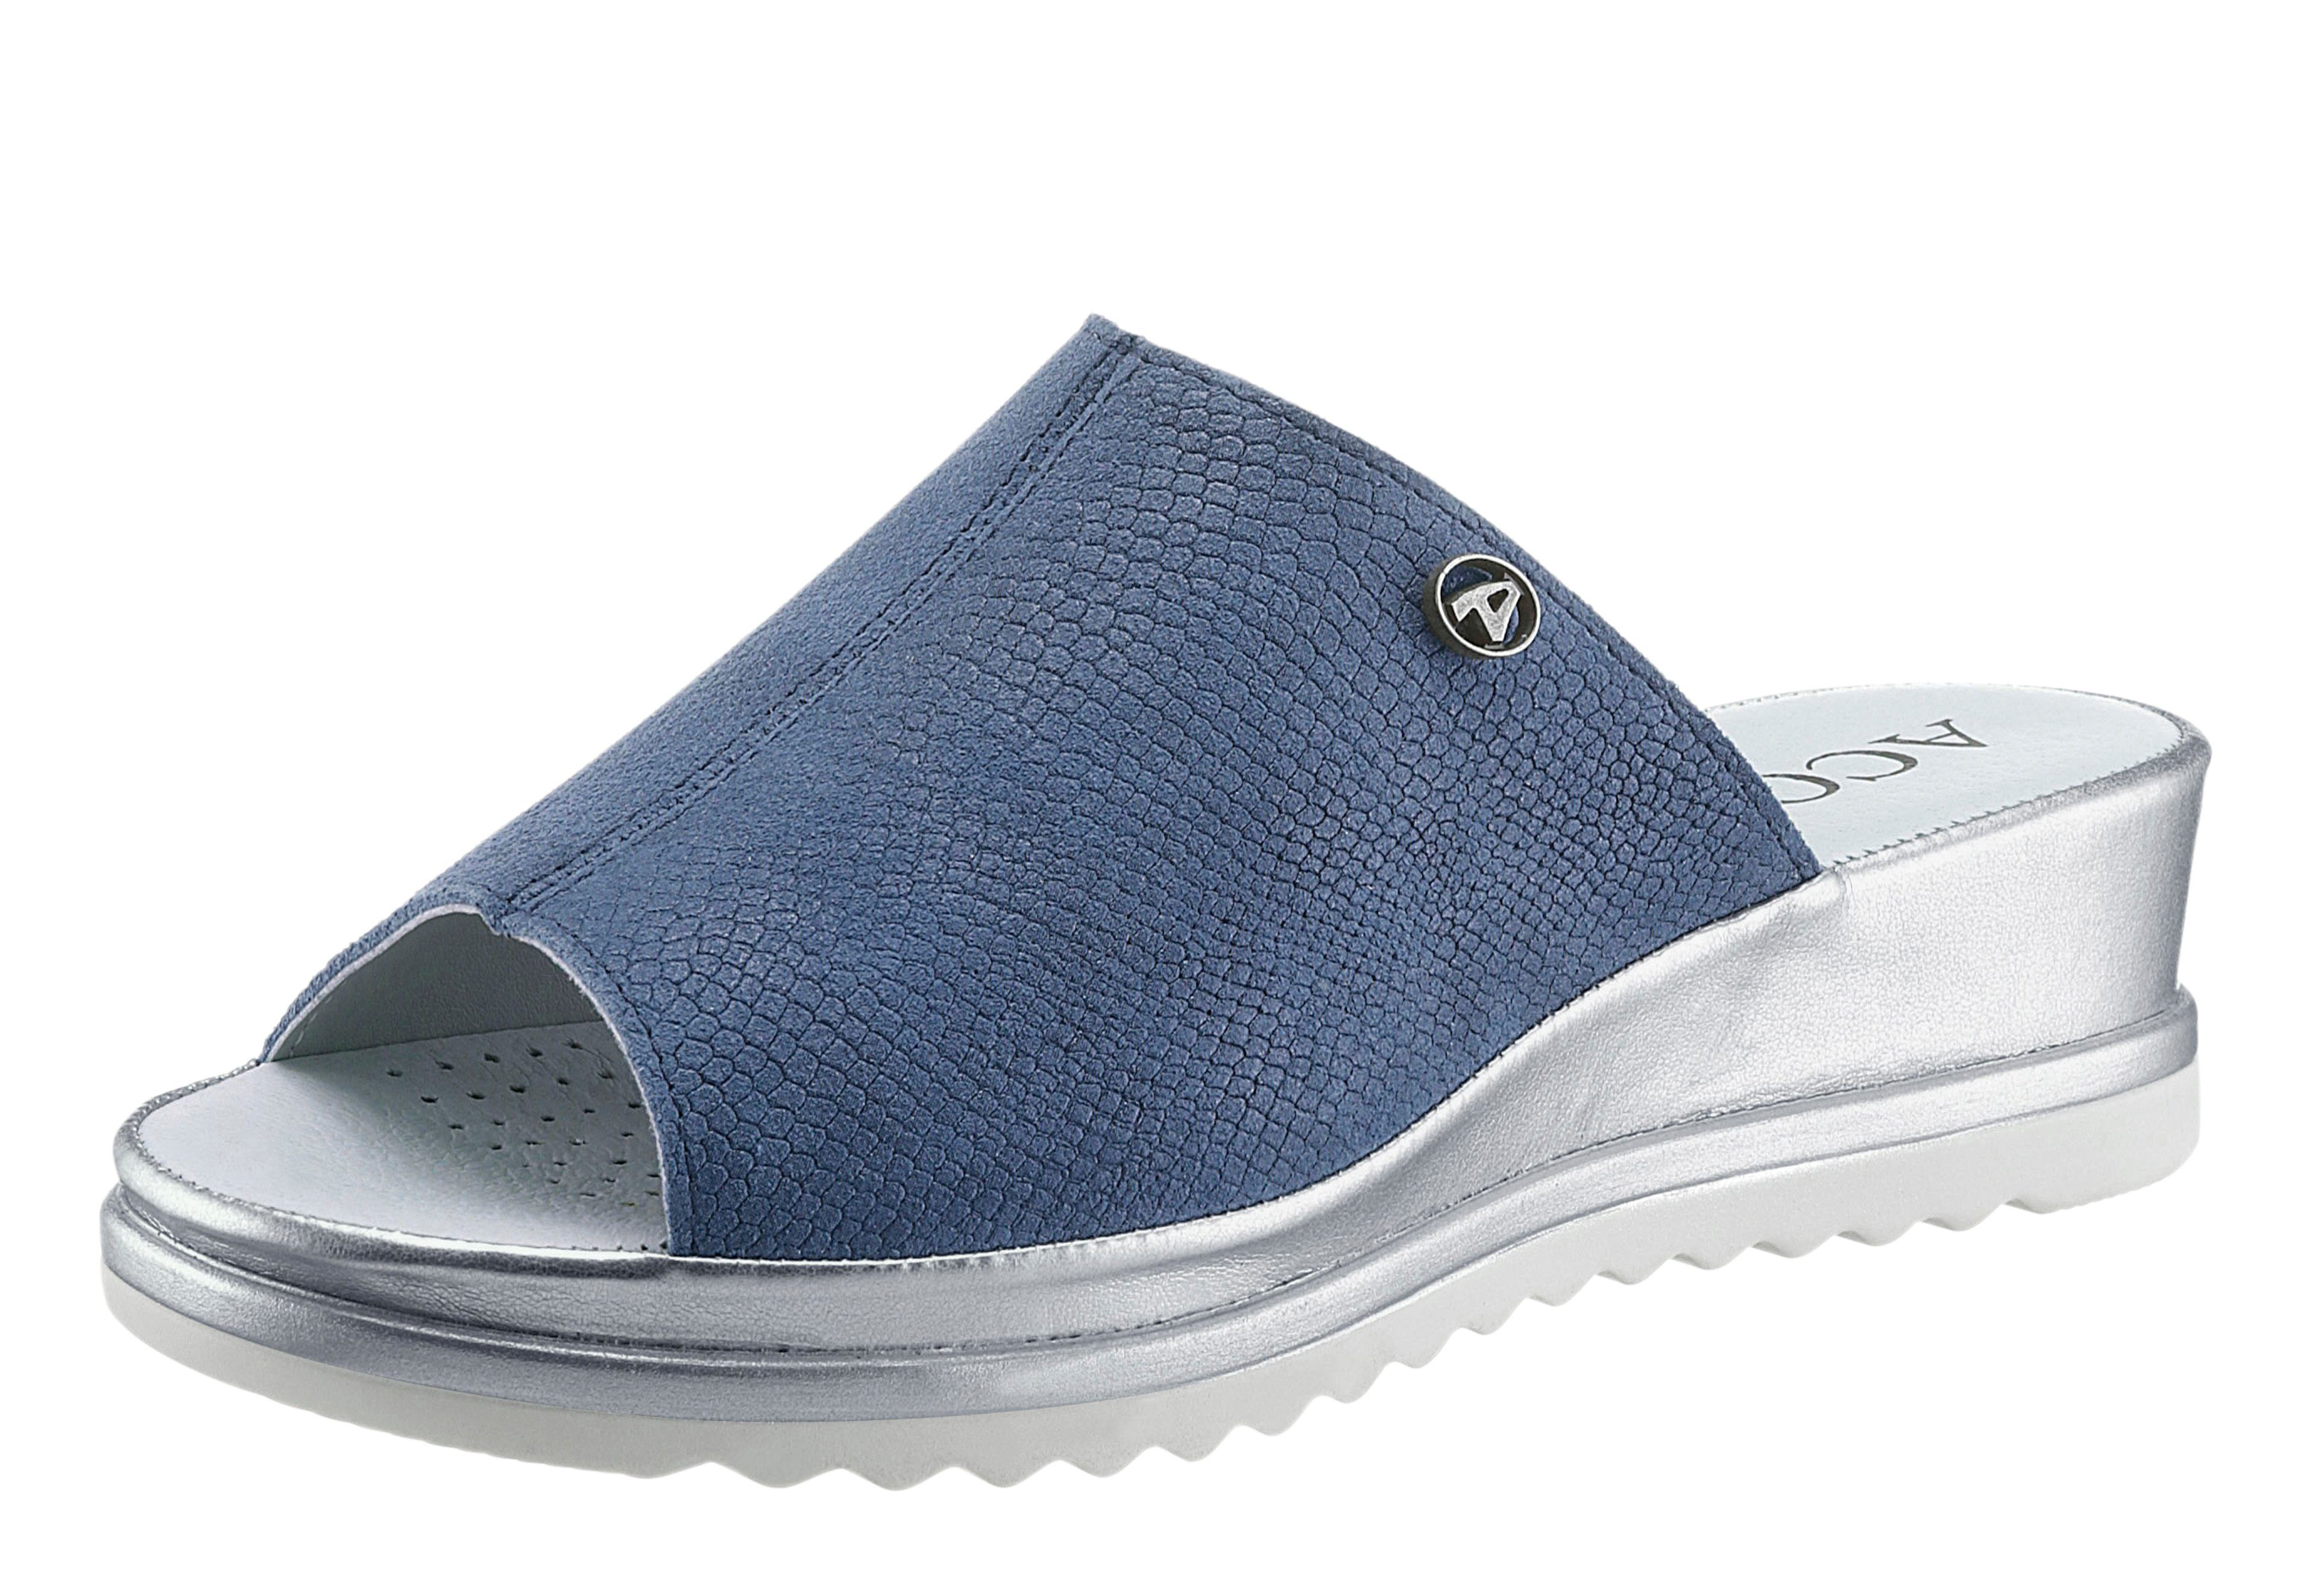 Aco Pantolette in aufwändiger California-Machart  jeansblau